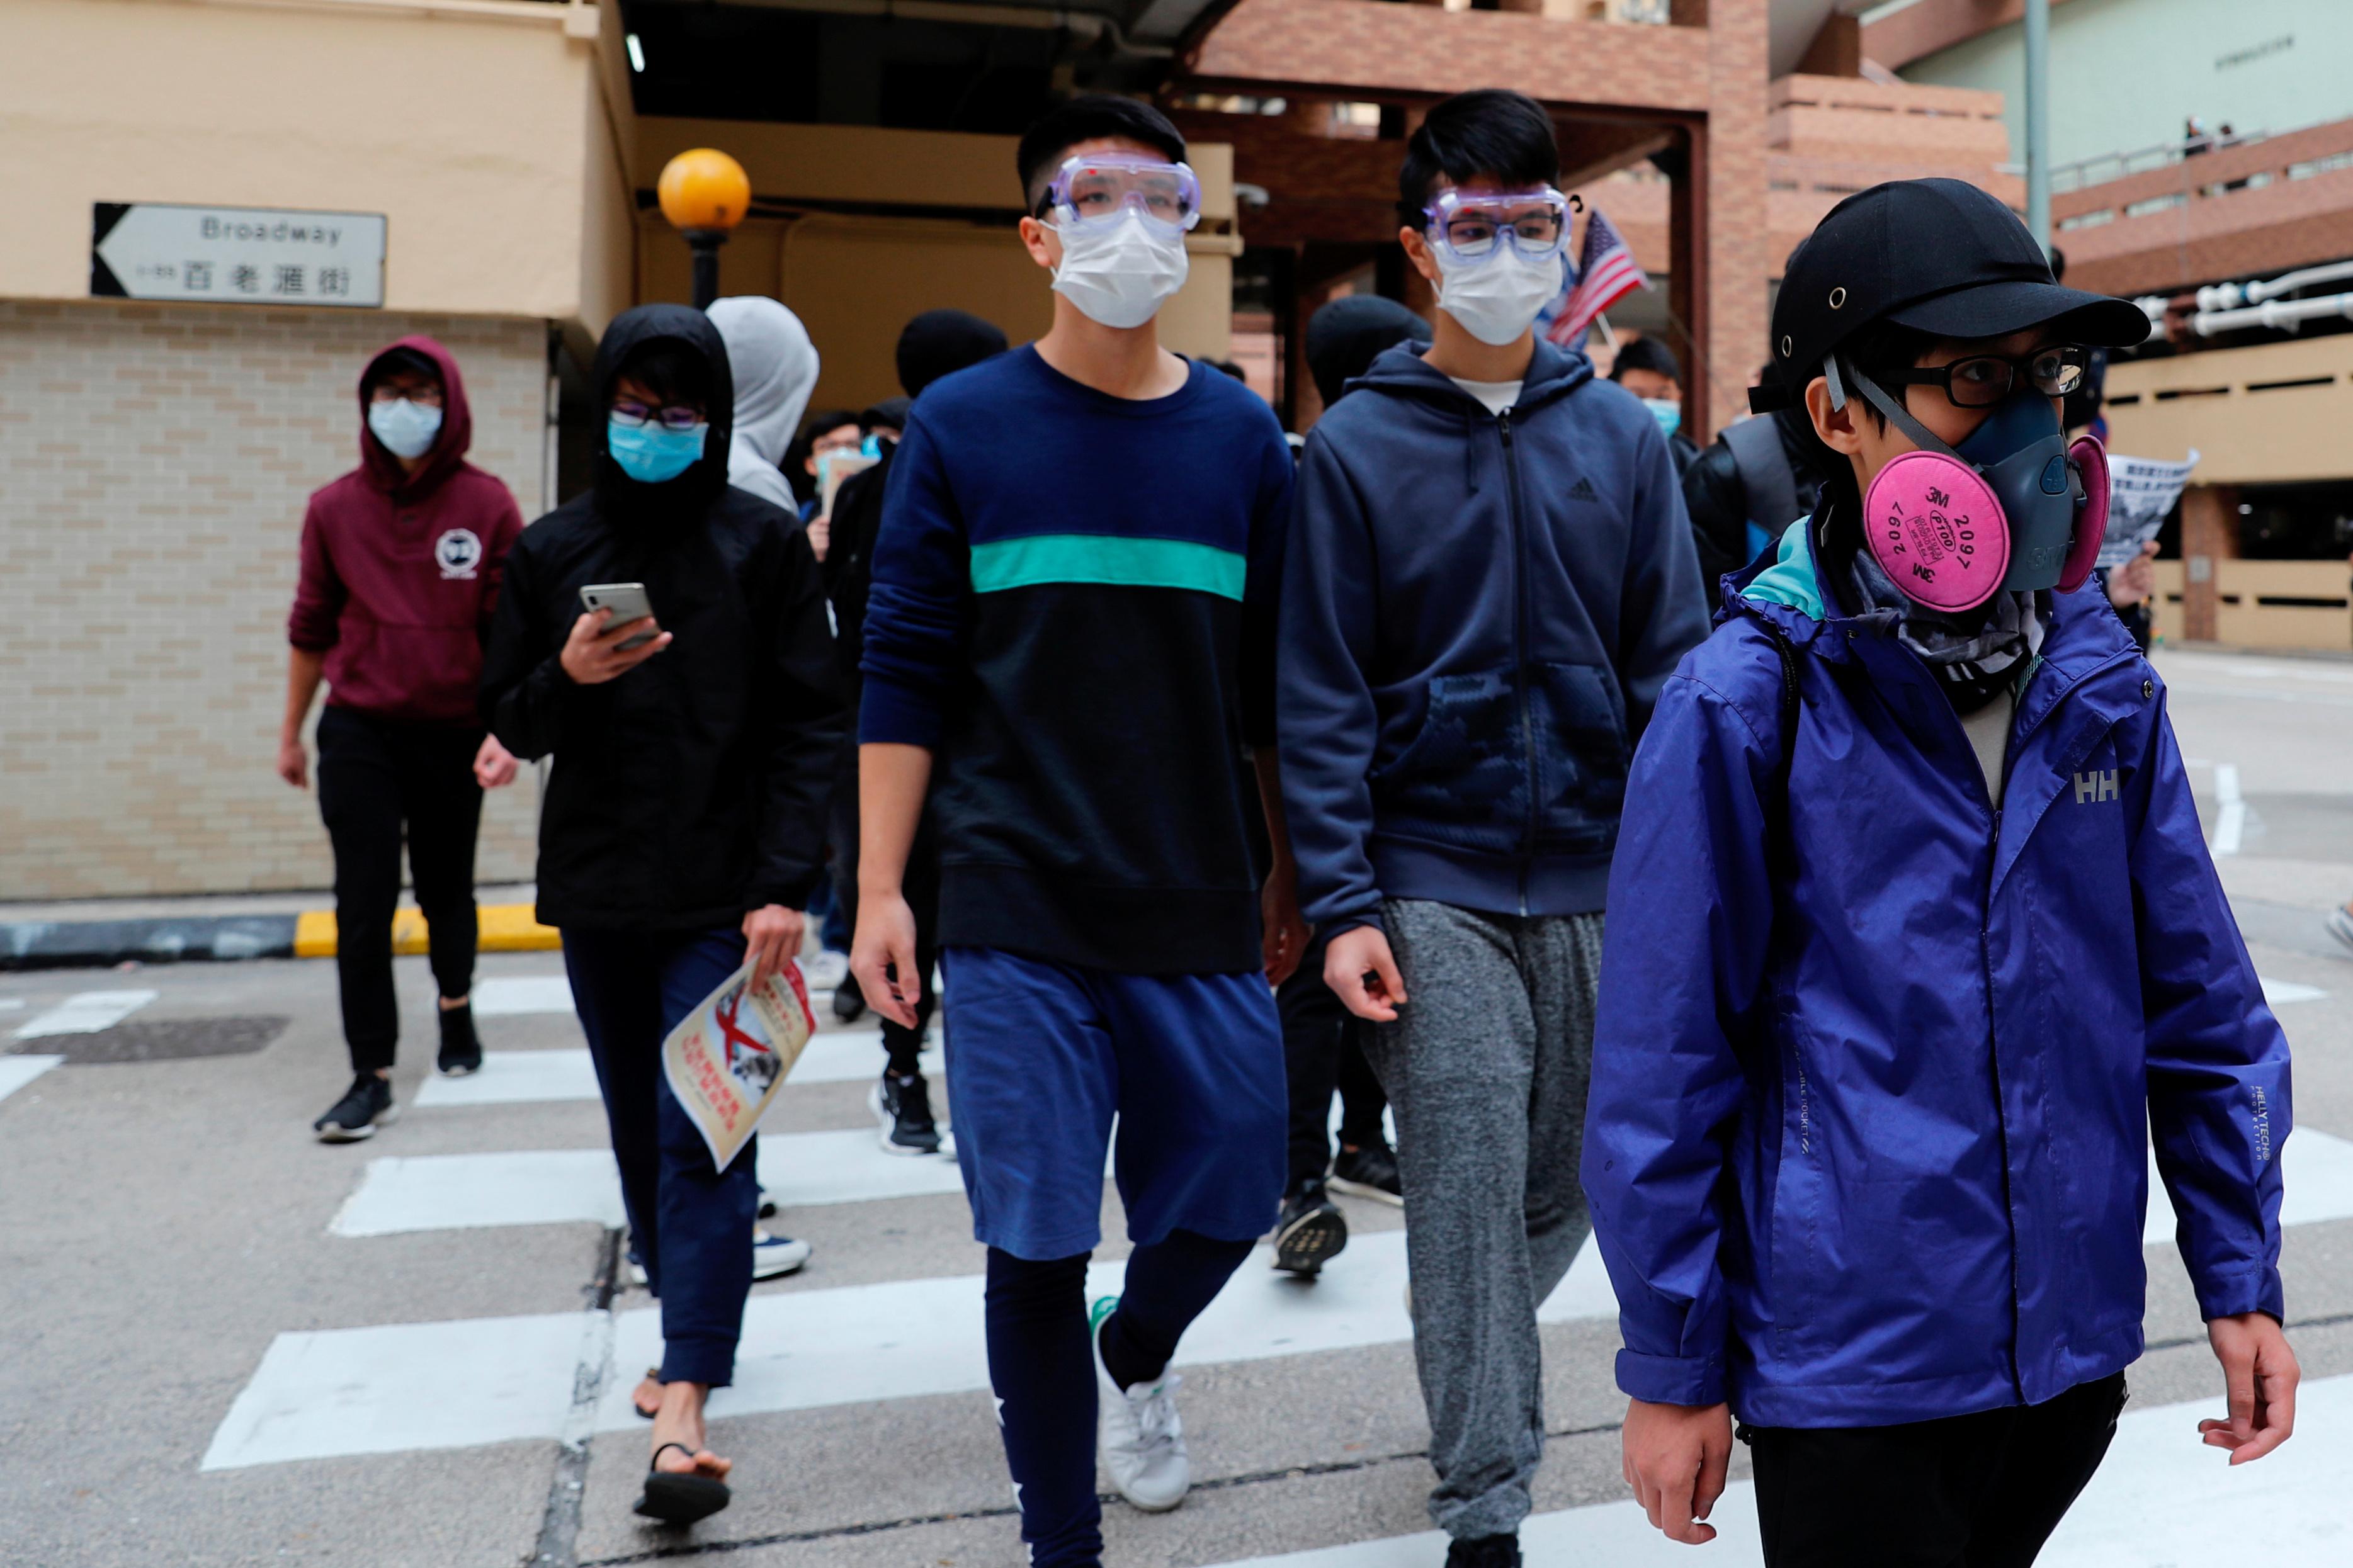 carona virus in hong kong